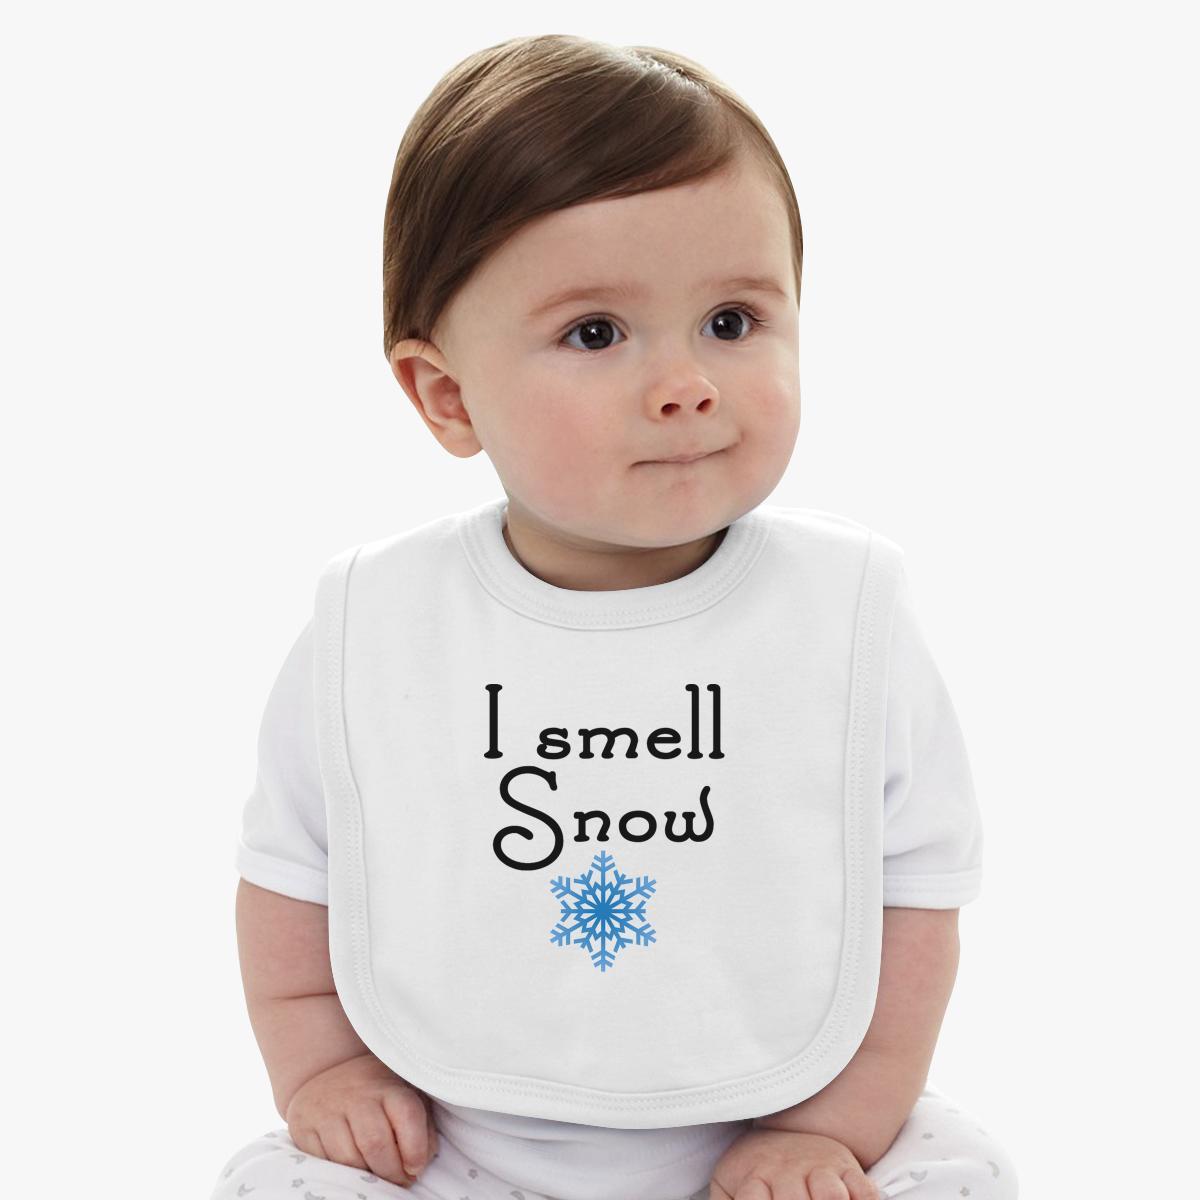 Gilmore Girls - I smell Snow  Baby Bib